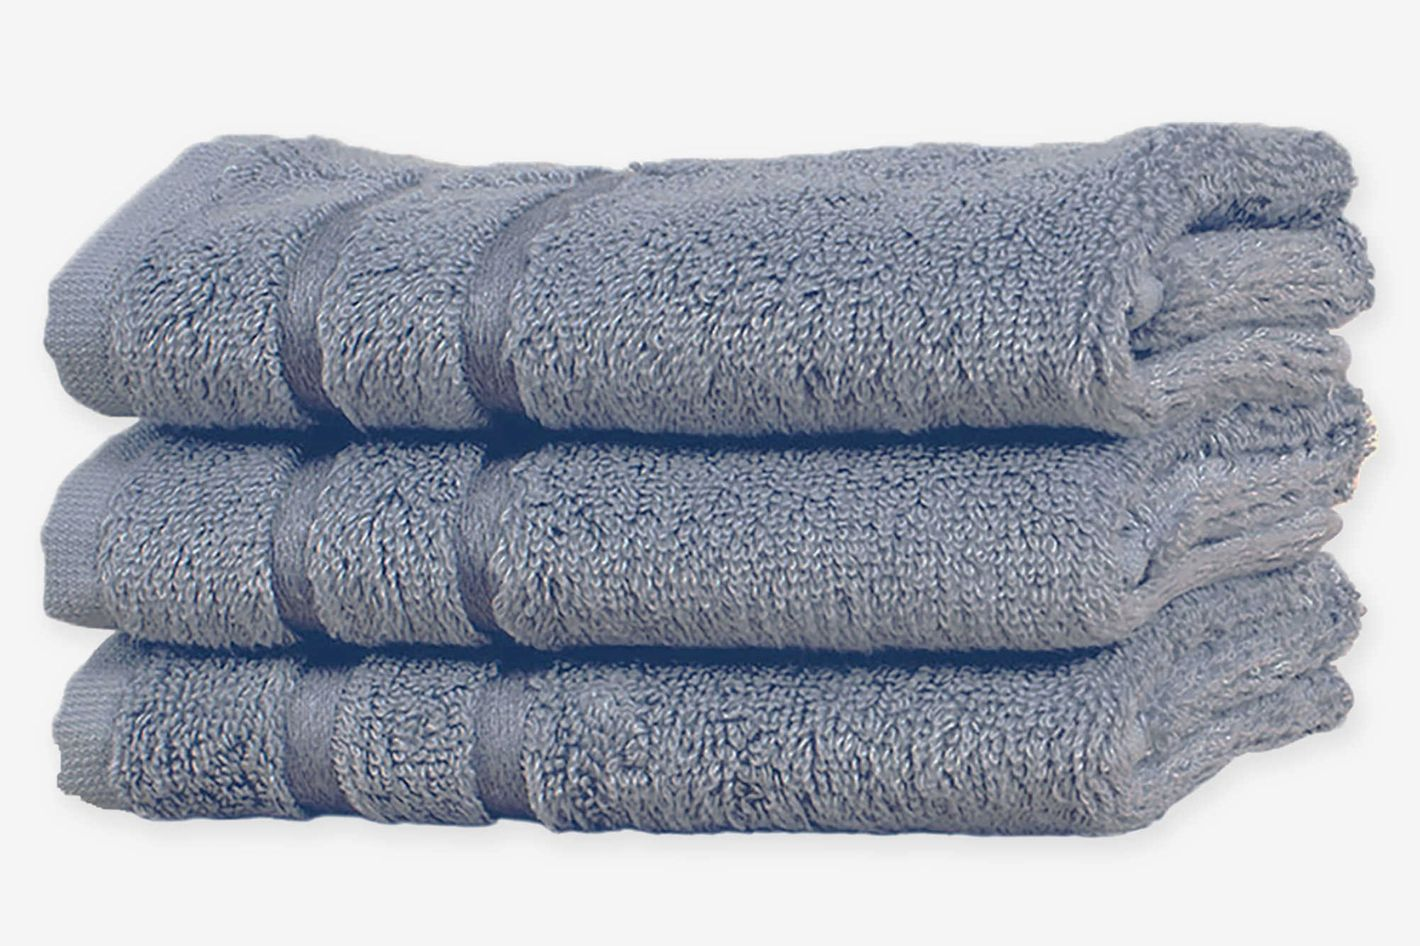 Cariloha Bamboo Fingertip Towel (Set of 3)